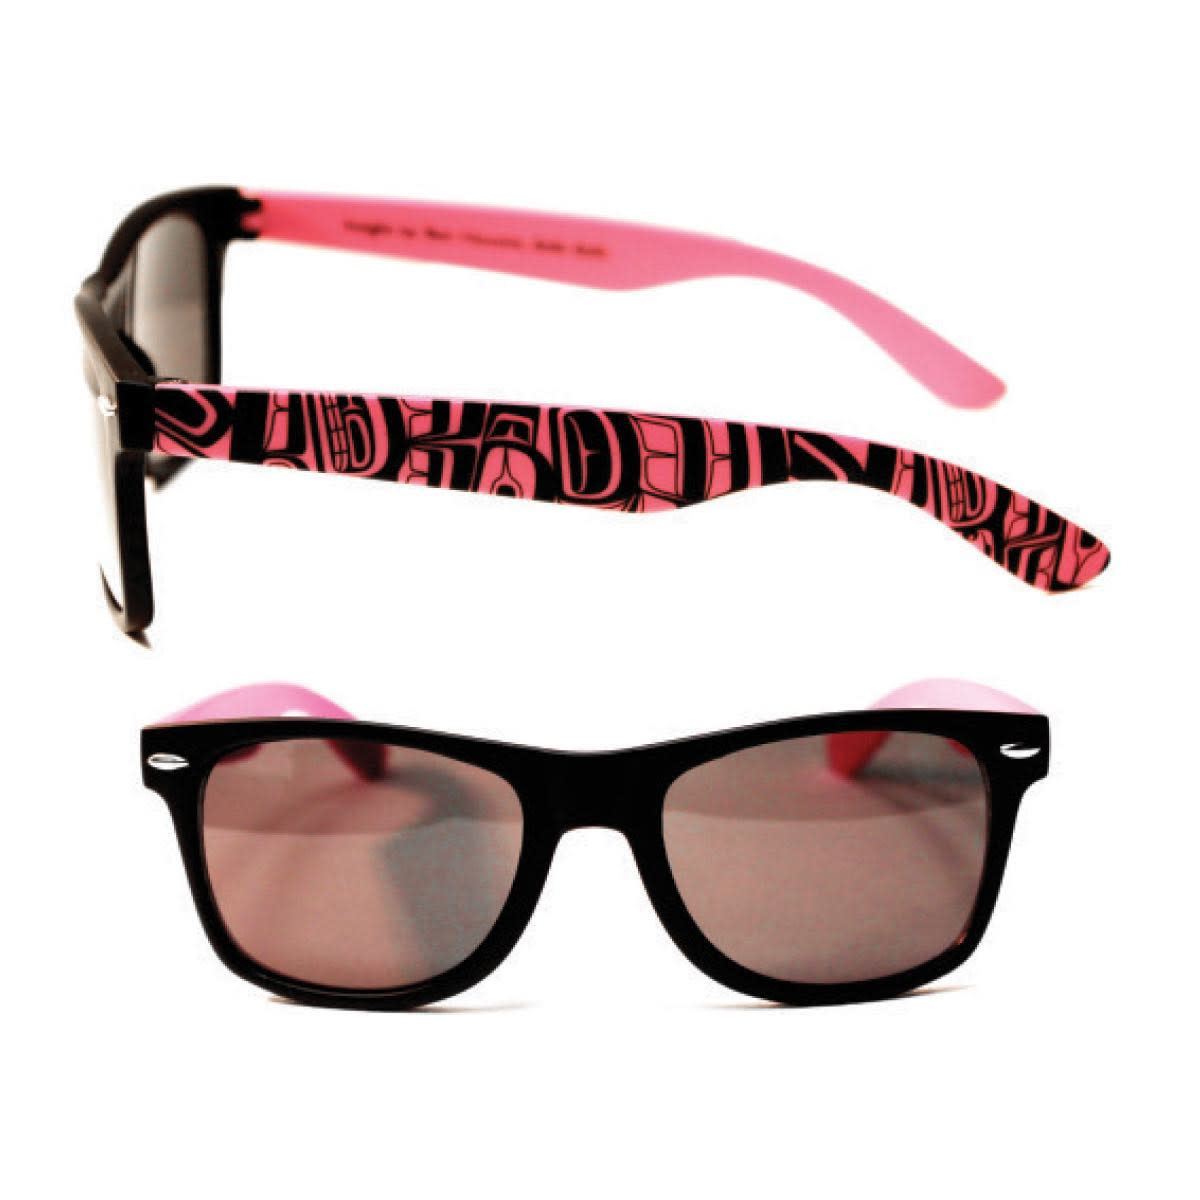 SunGlasses - Adult-10